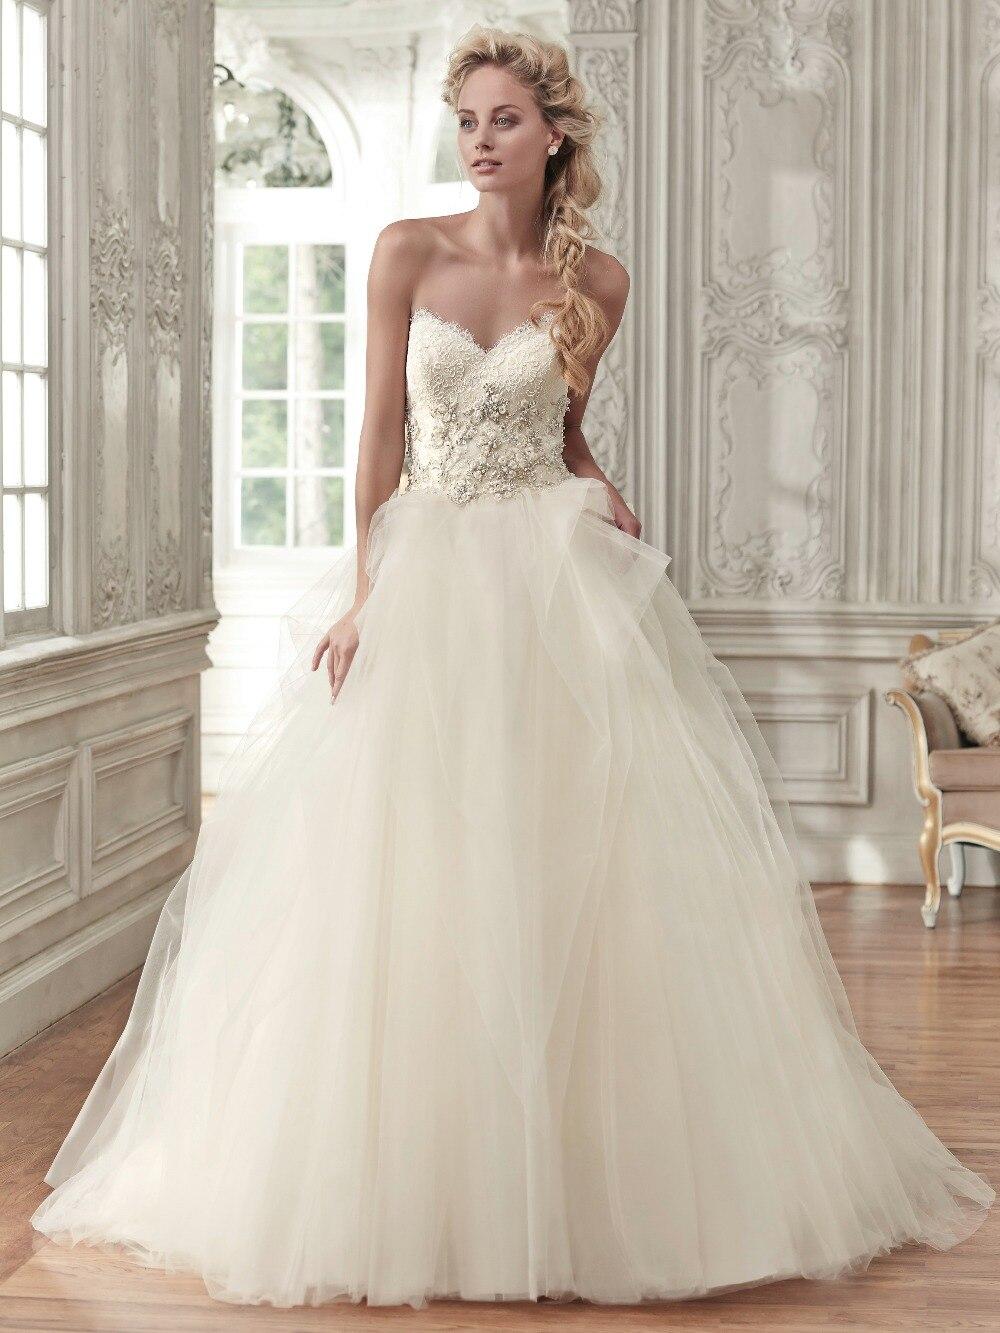 Stunning Ball Gown Wedding Dress Tulle Skirt Sweetheart Neckline ...